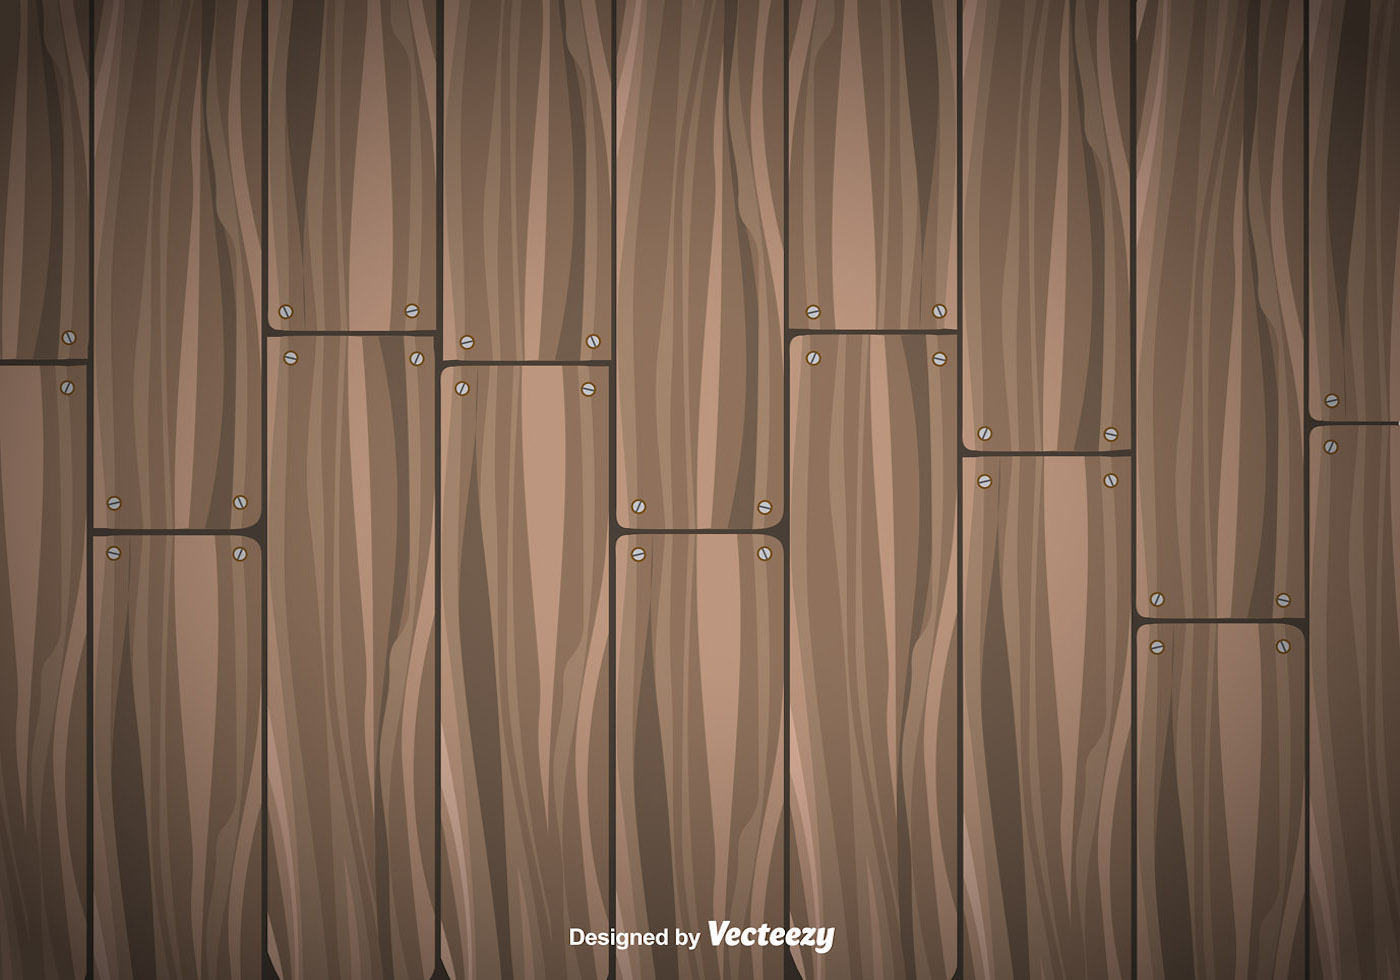 Wooden Planks Vector Background Download Free Vector Art